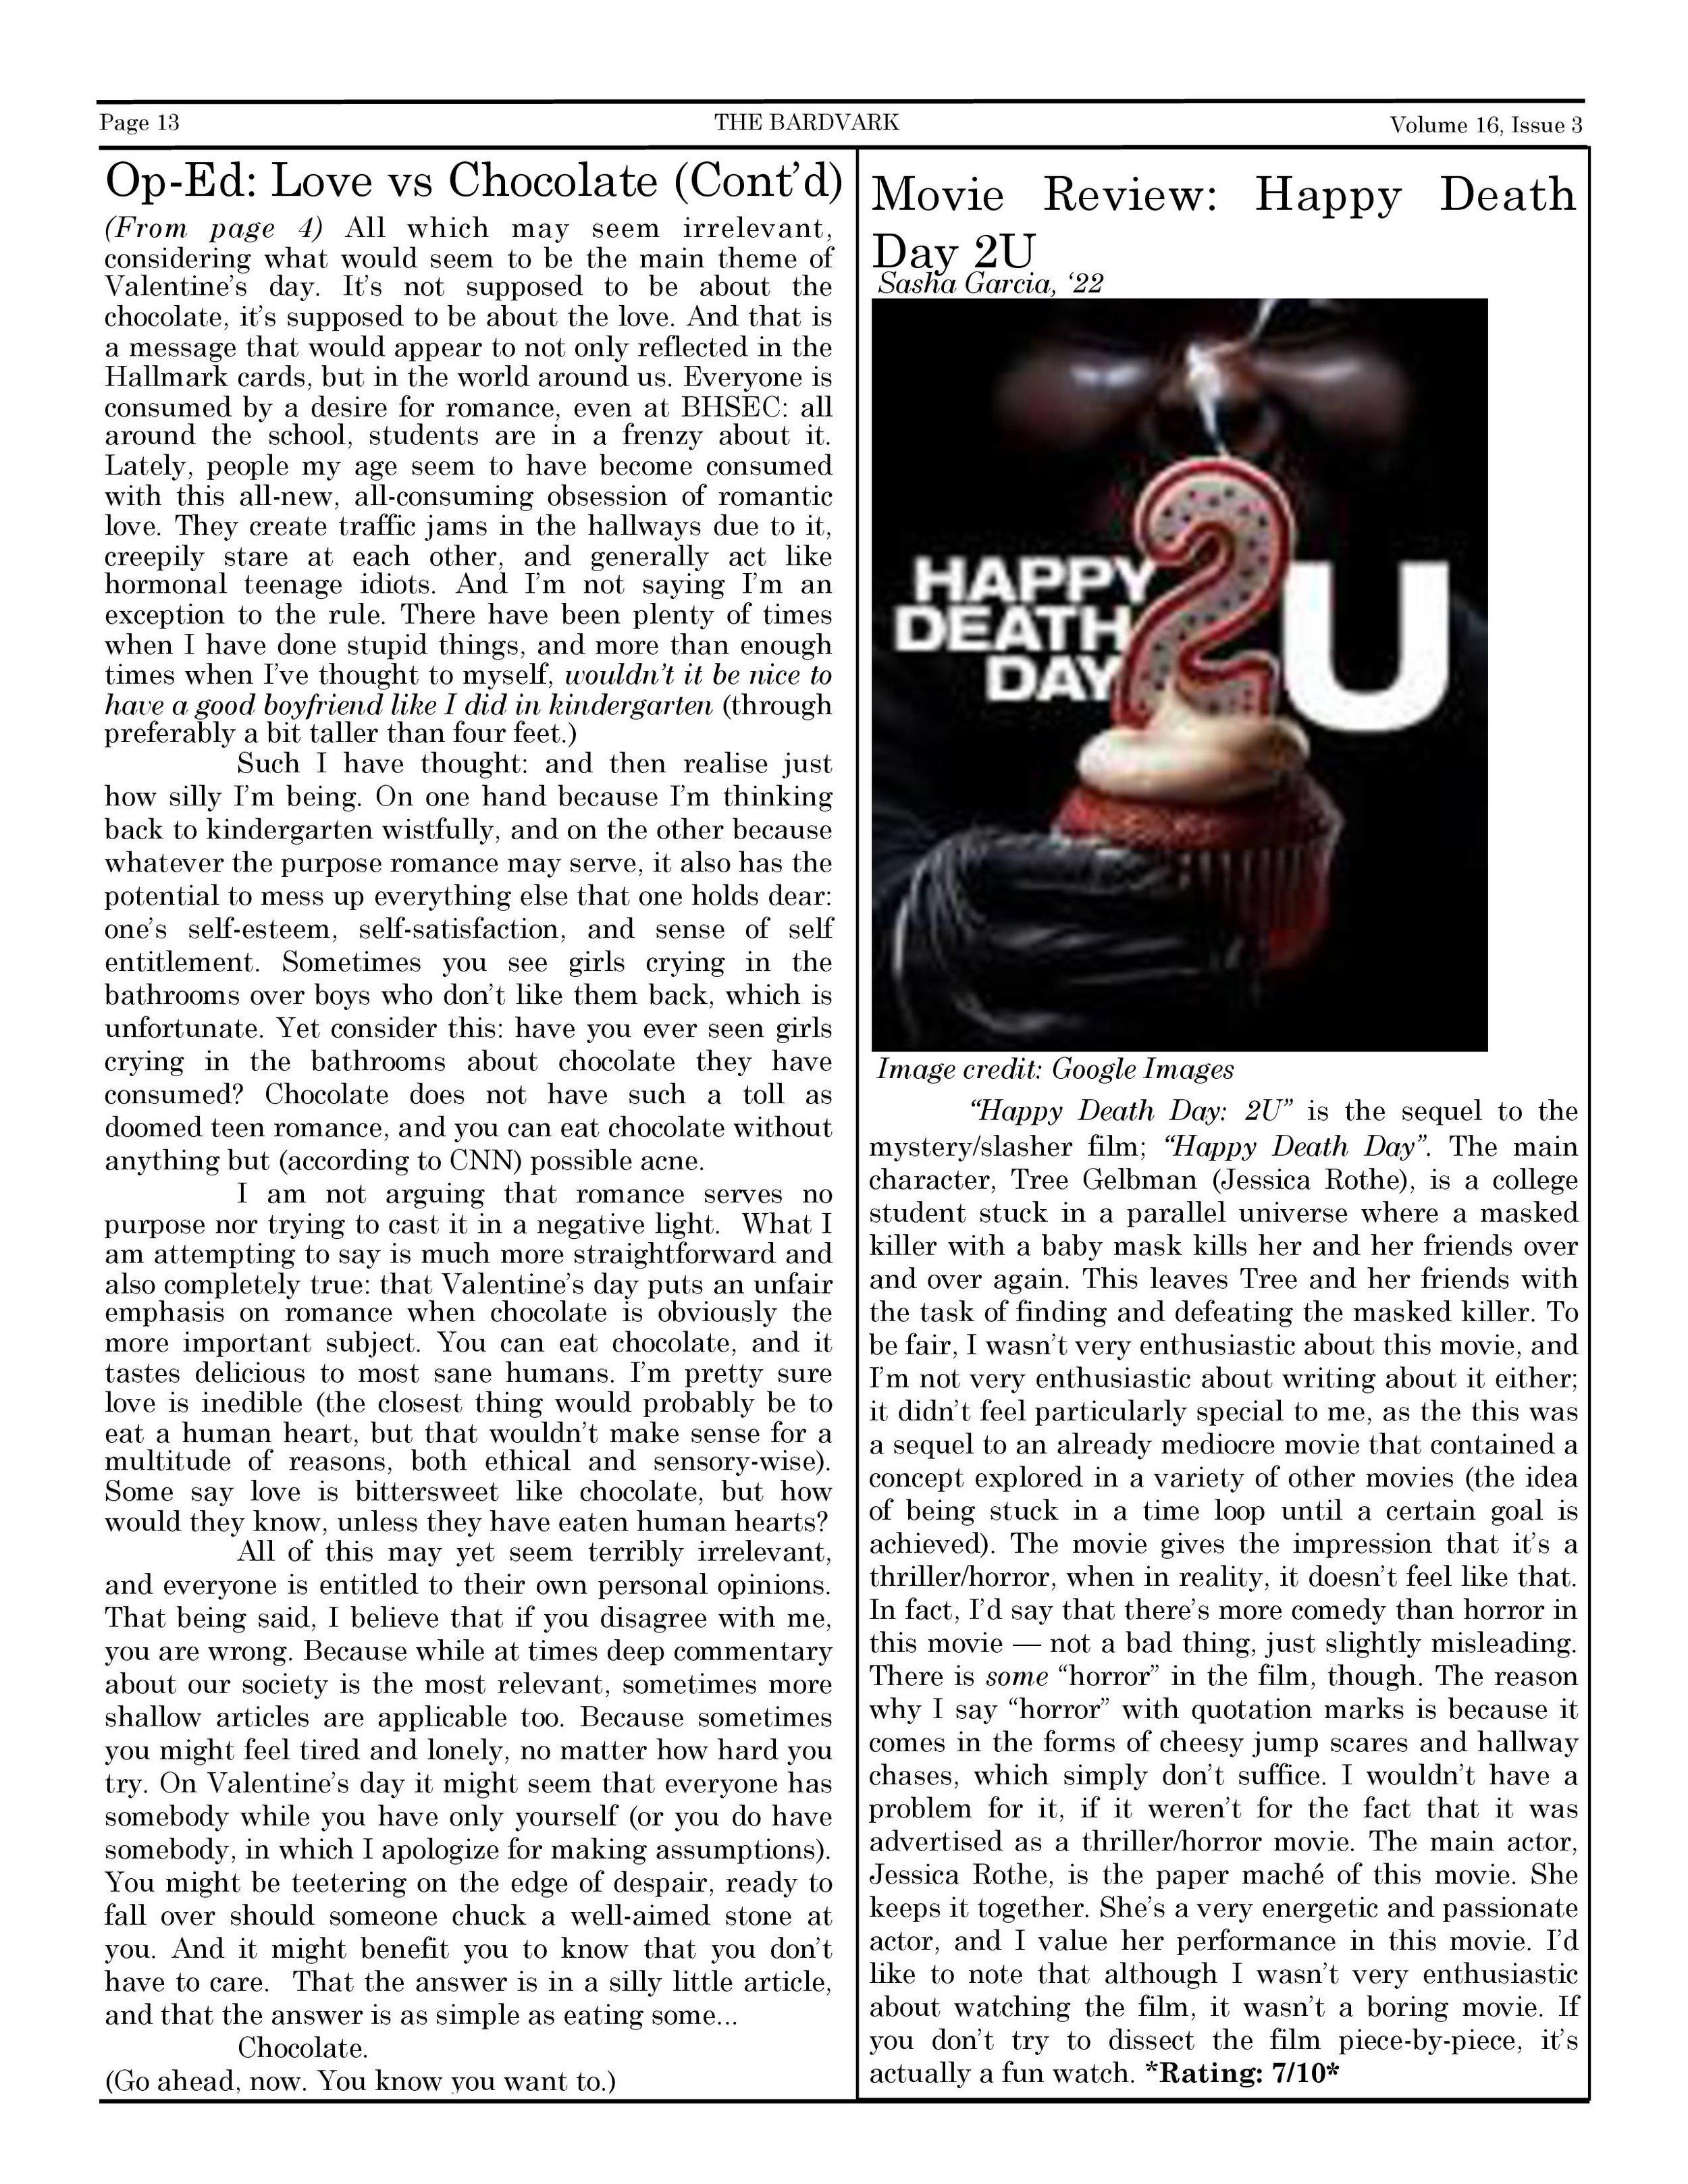 Issue 6 February 2019-13.jpg